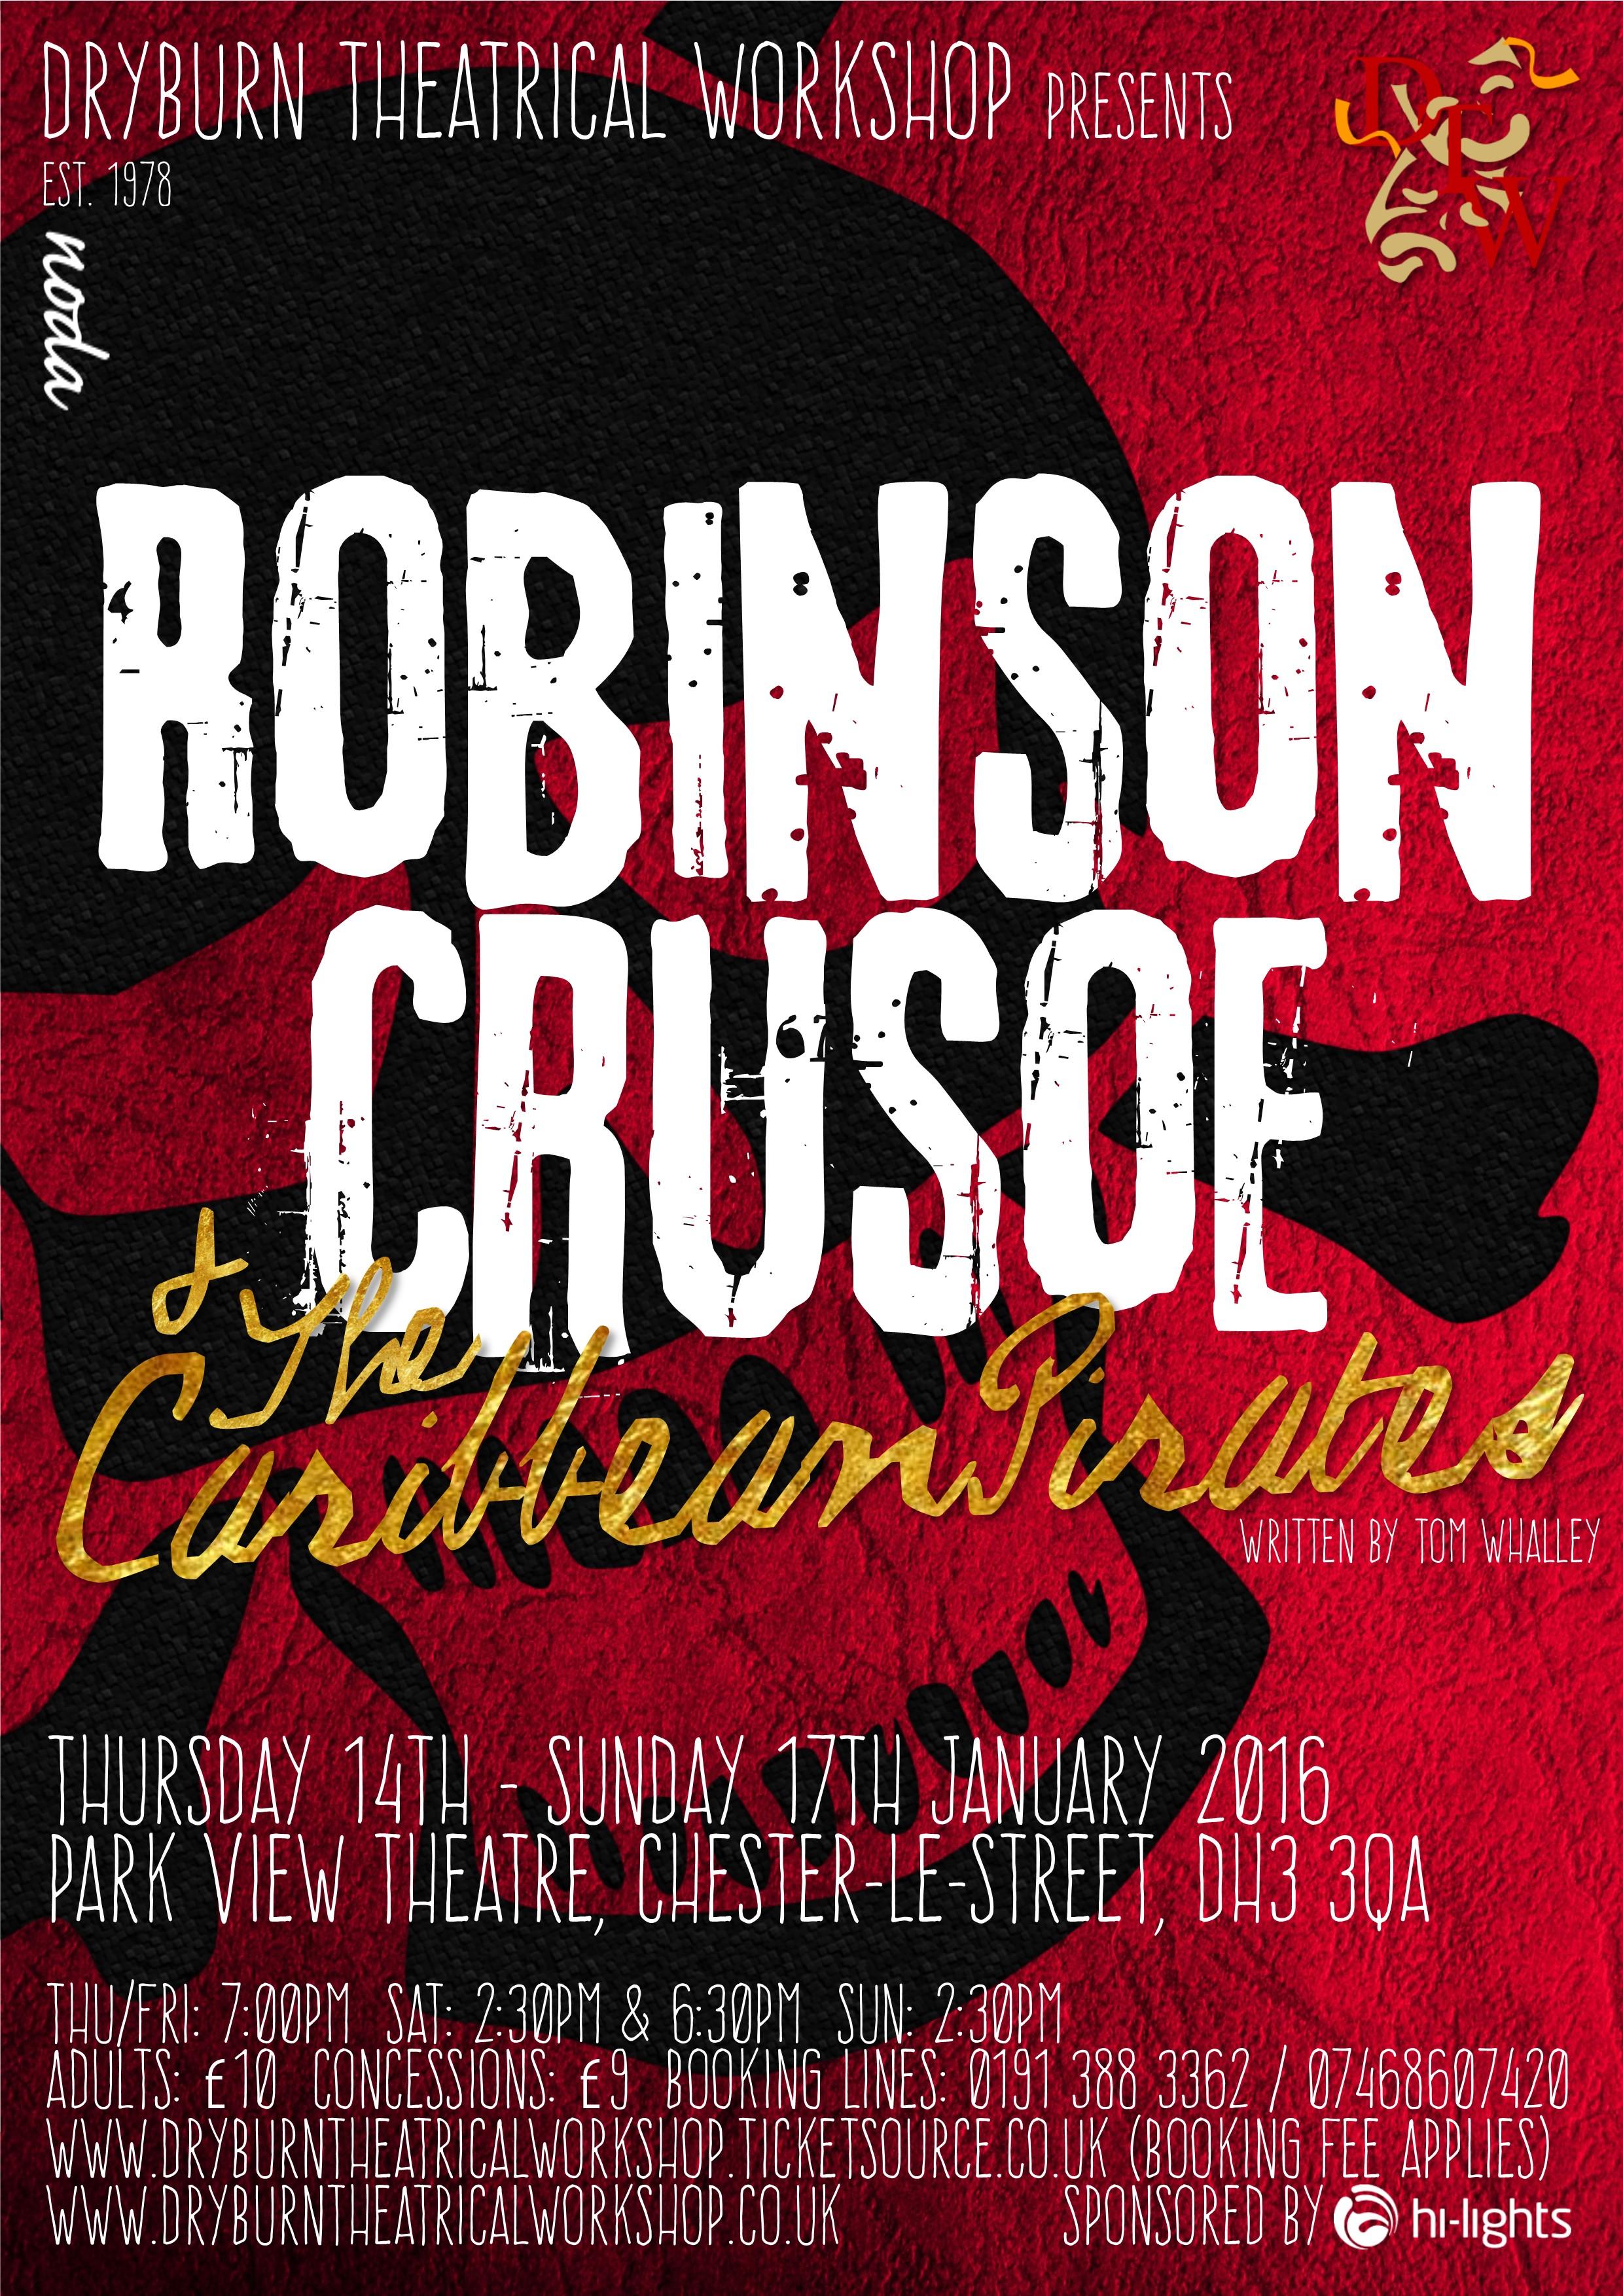 """THE NAME IS ROBINSON. ROBINSON CRUSOE."" -"